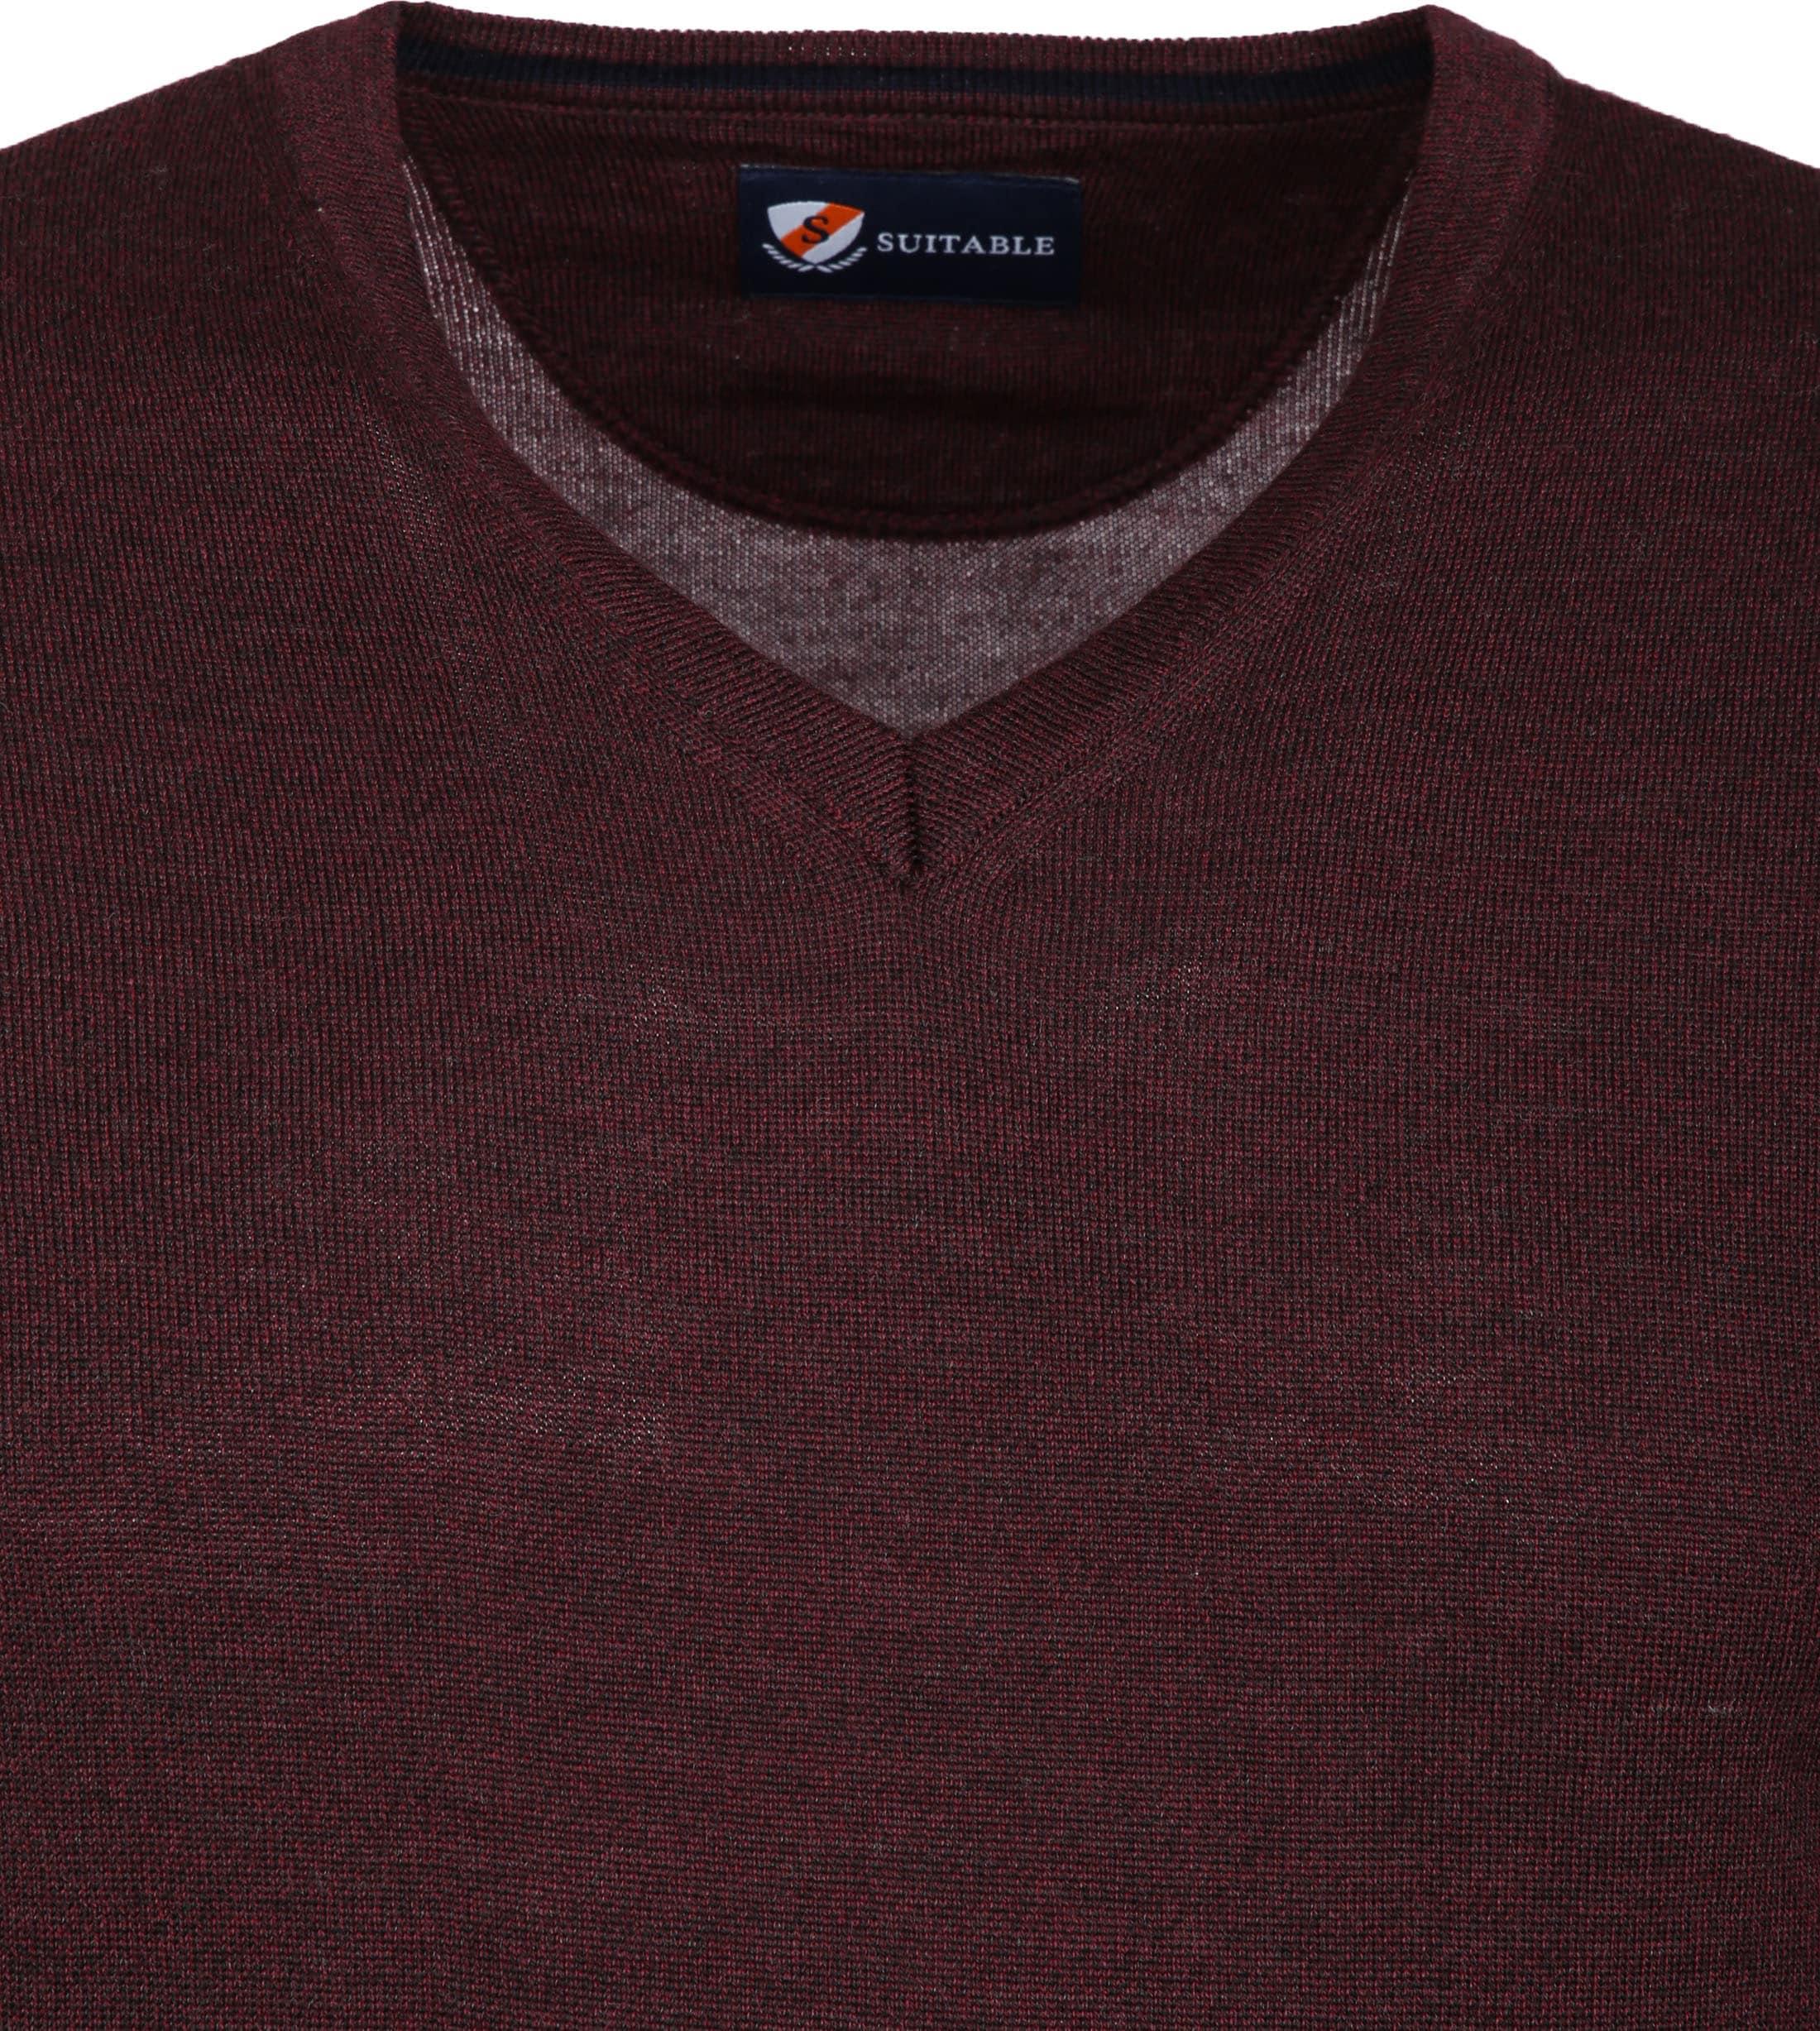 Suitable Merino Pullover Bordeaux foto 1